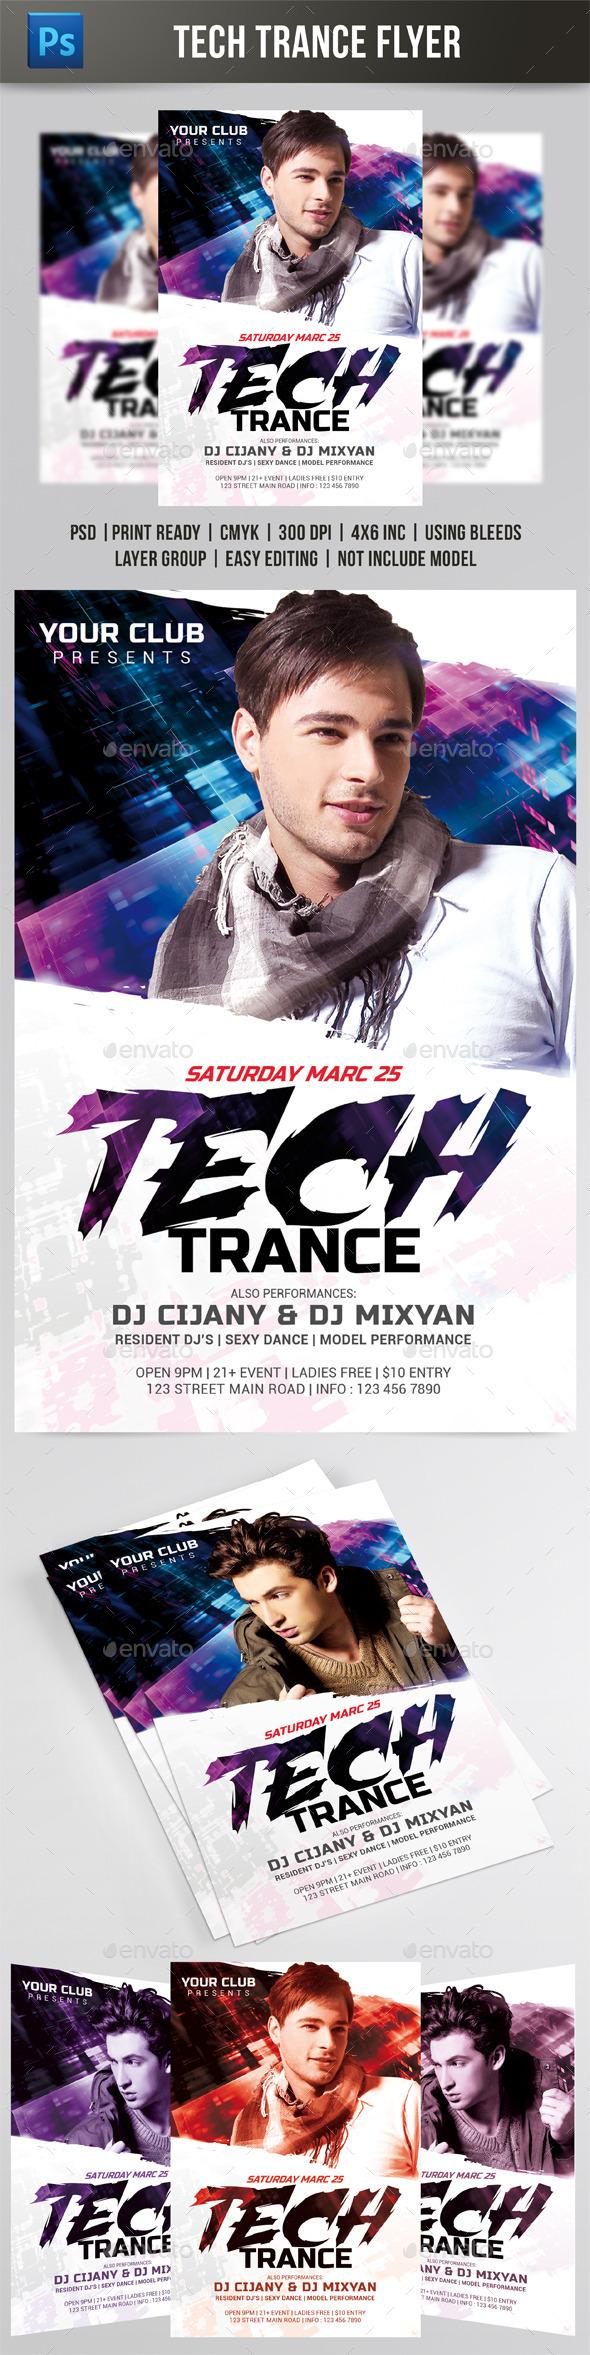 Tech Trance Flyer - Events Flyers